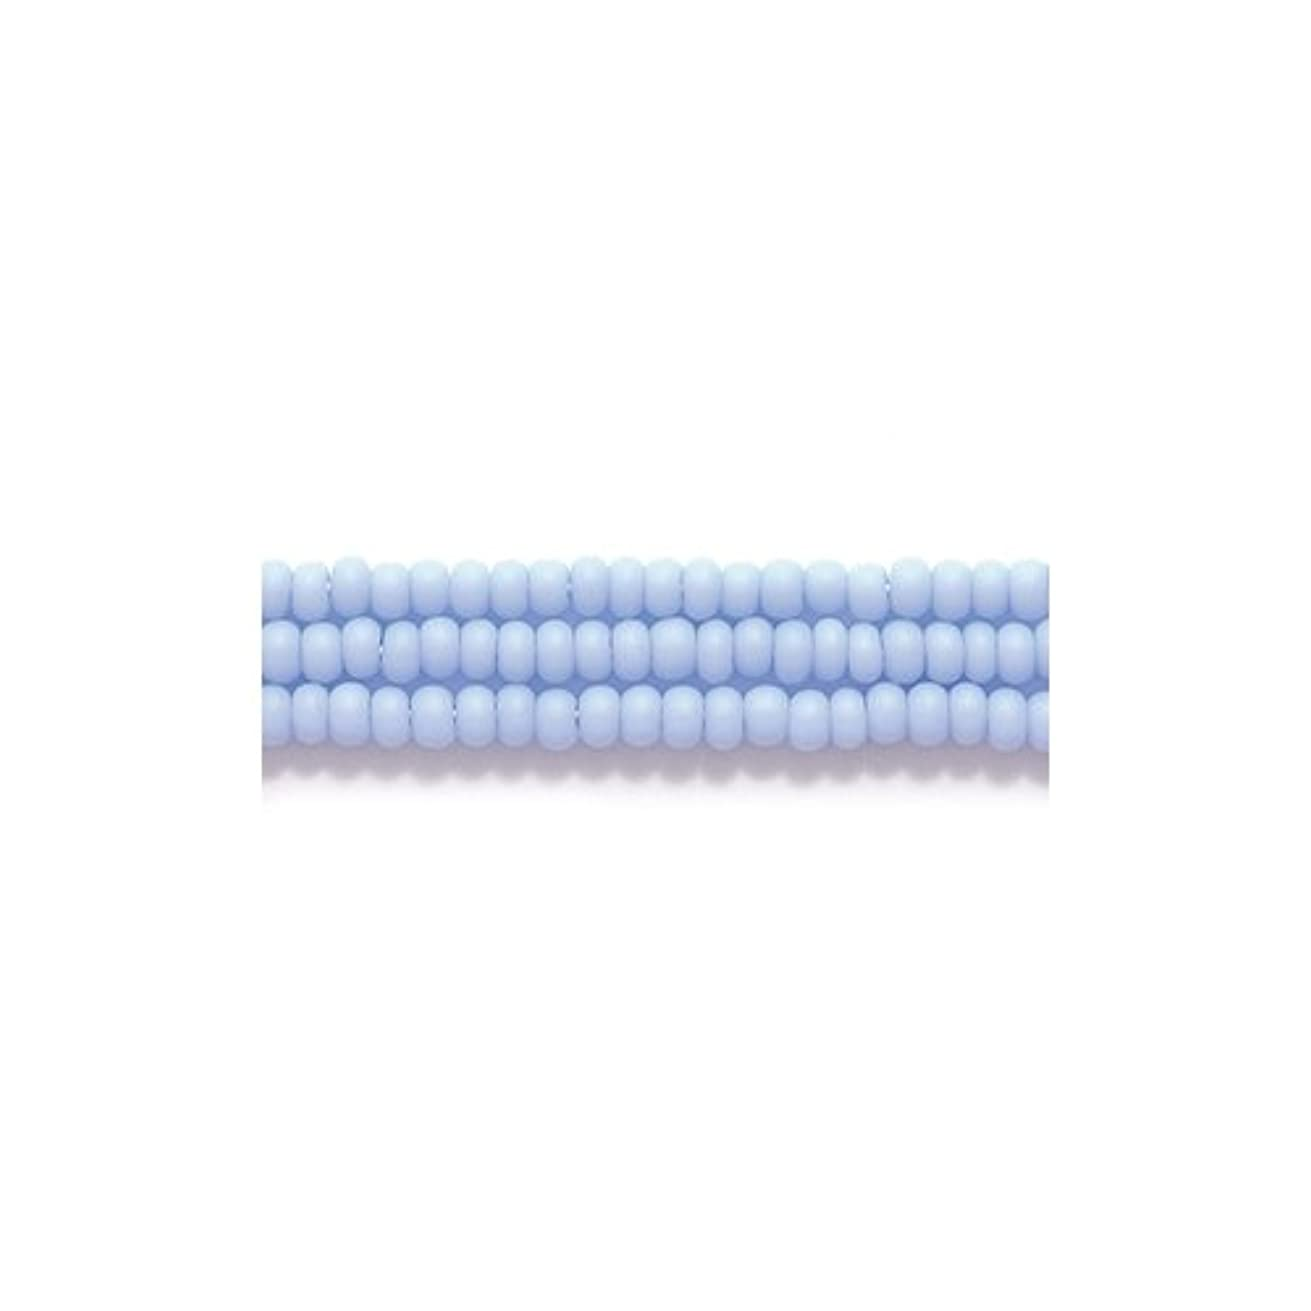 Preciosa Ornela Czech Seed Bead, Opaque Matte Pale Blue, Size 11/0